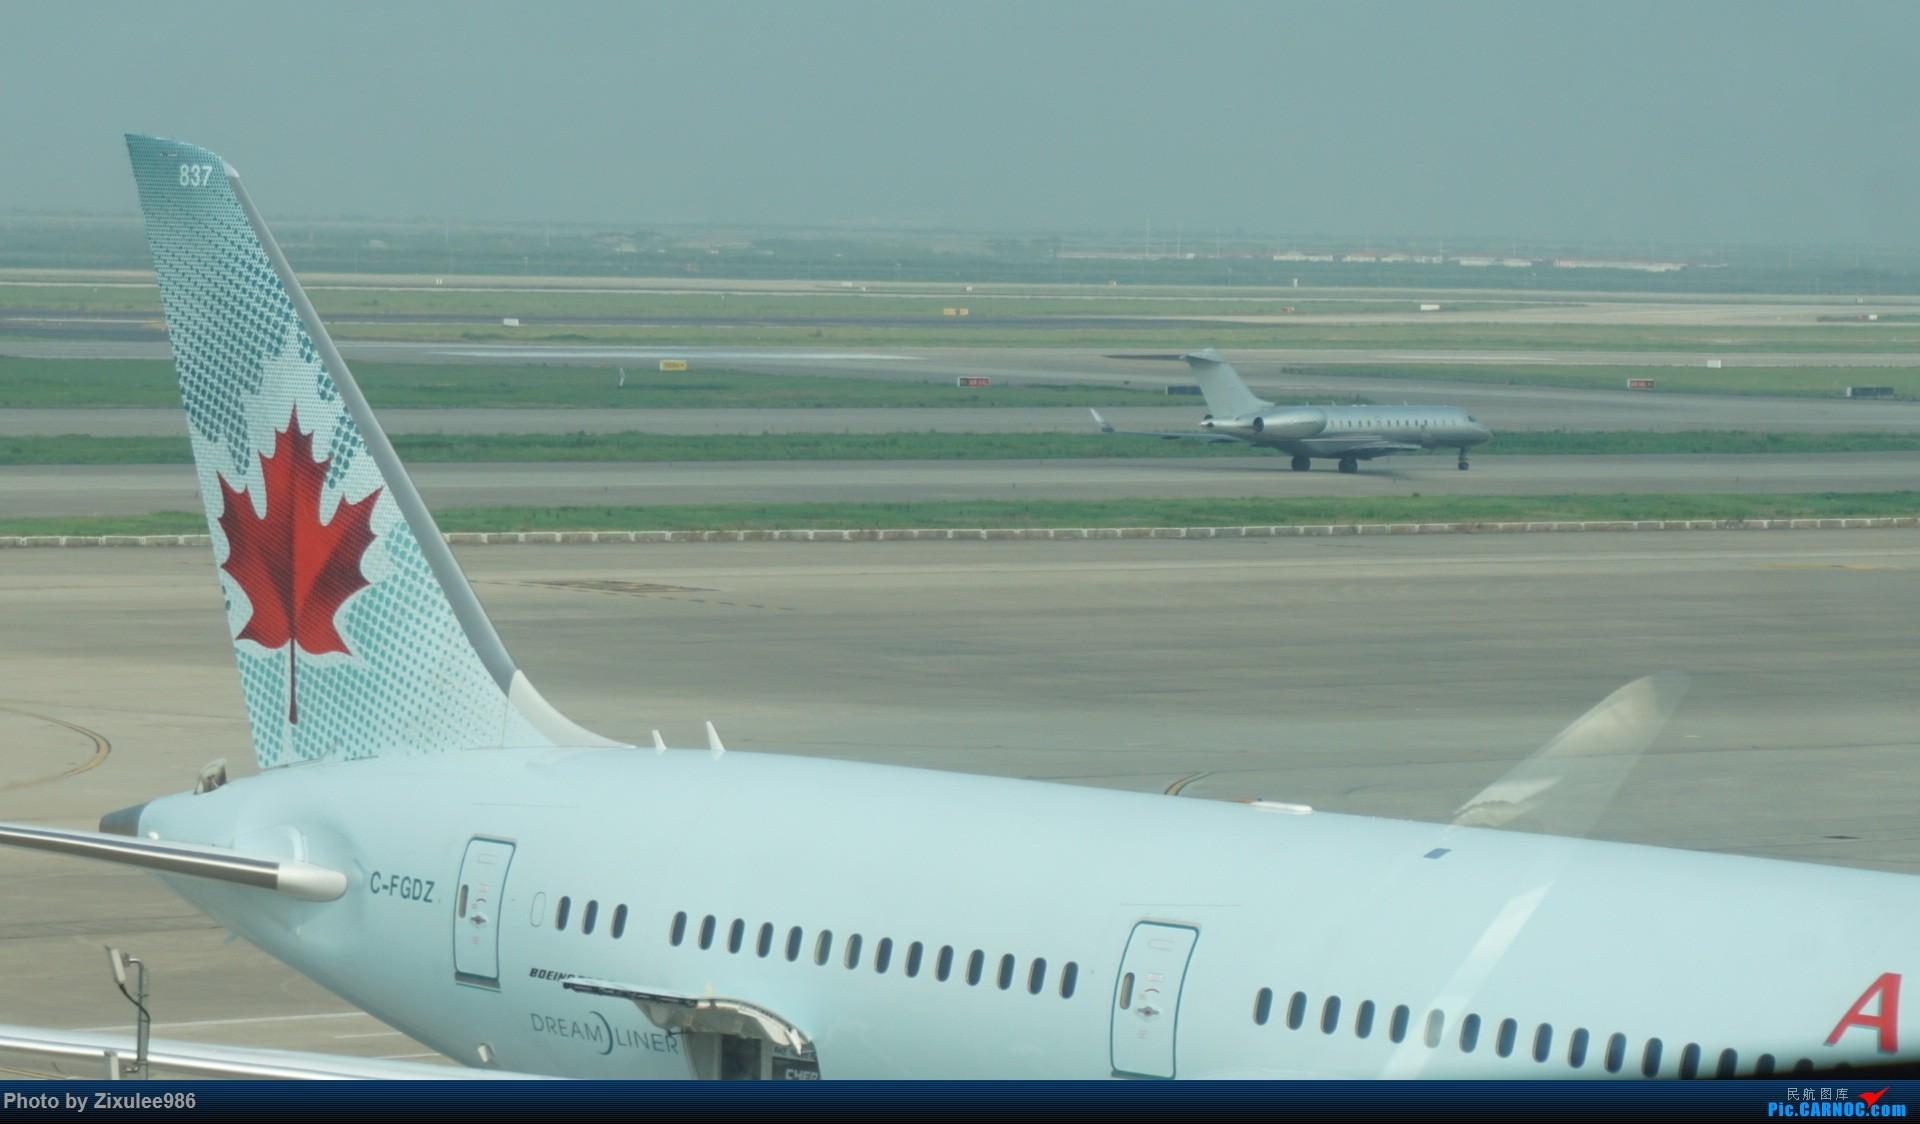 Re:[原创]加拿大21日游学之旅(一)~JJN-PVG-YYZ..(内含flightlog)~第一次发游记~多图缓更请谅解 BOMBARDIER GLOBAL 6000  中国上海浦东国际机场